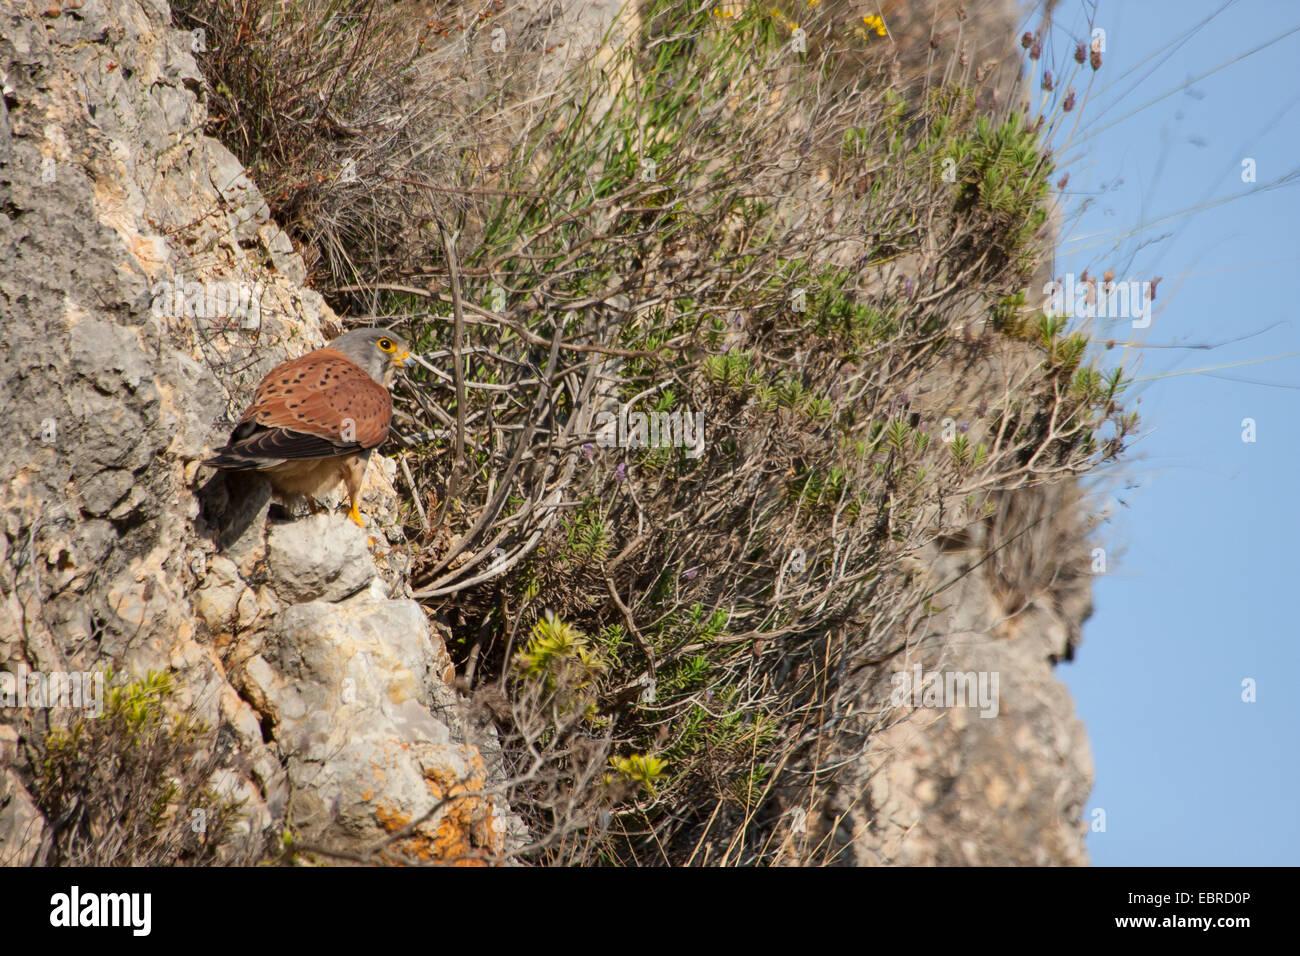 European Kestrel, Eurasian Kestrel, Old World Kestrel, Common Kestrel (Falco tinnunculus), sits on a ledge, Spain, - Stock Image